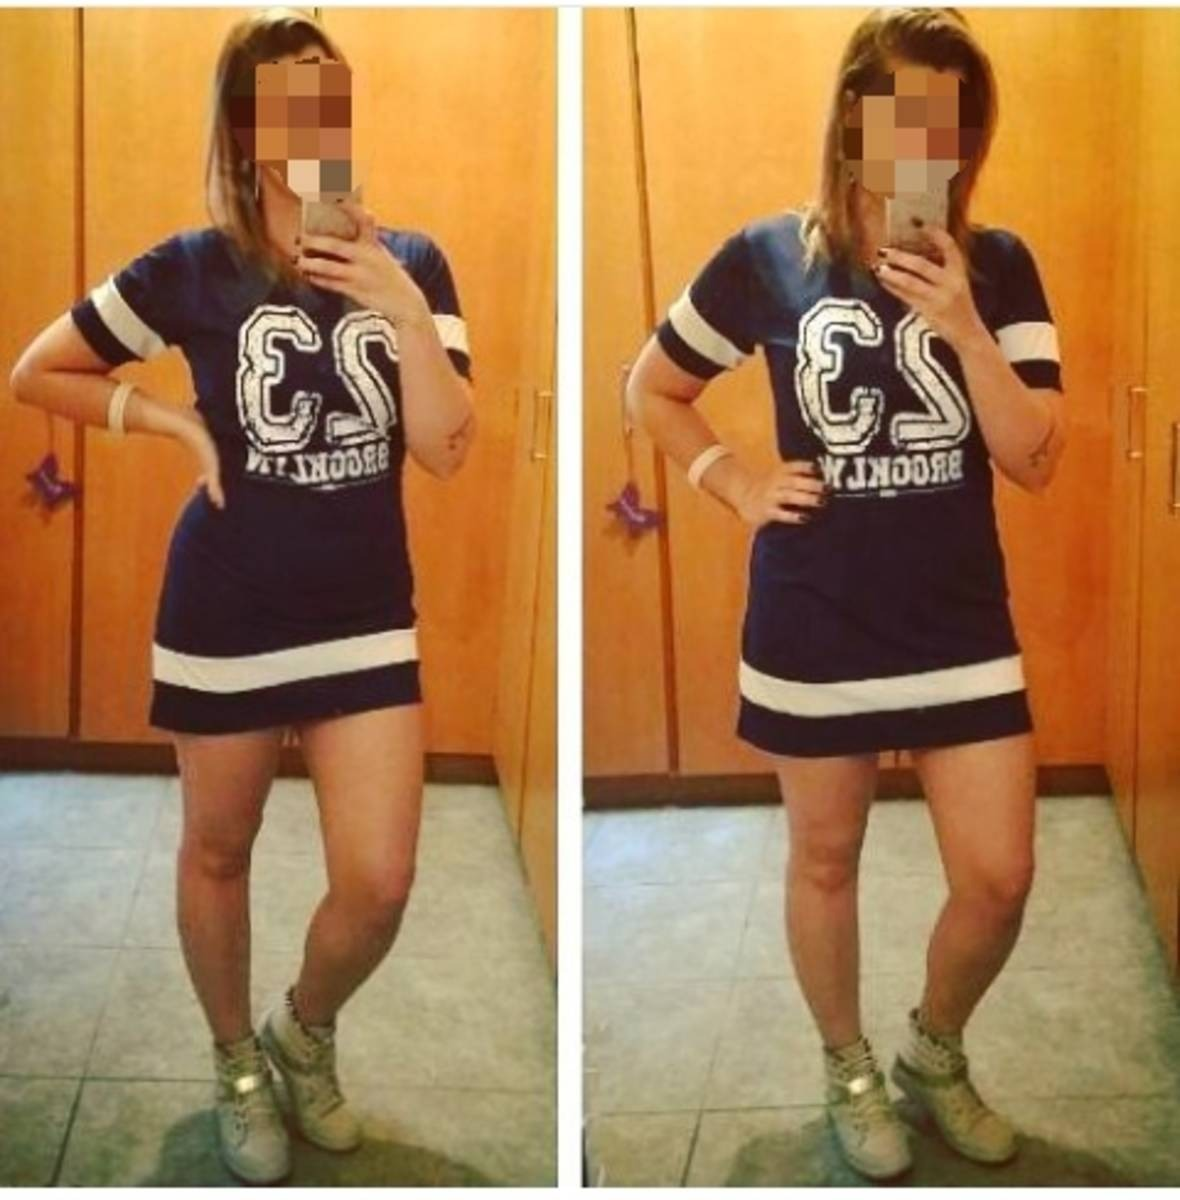 Vestido Camiseta Feminina Roupa Estilo Tumblr Básico Casual - R  80 ... 39b2f335747d2